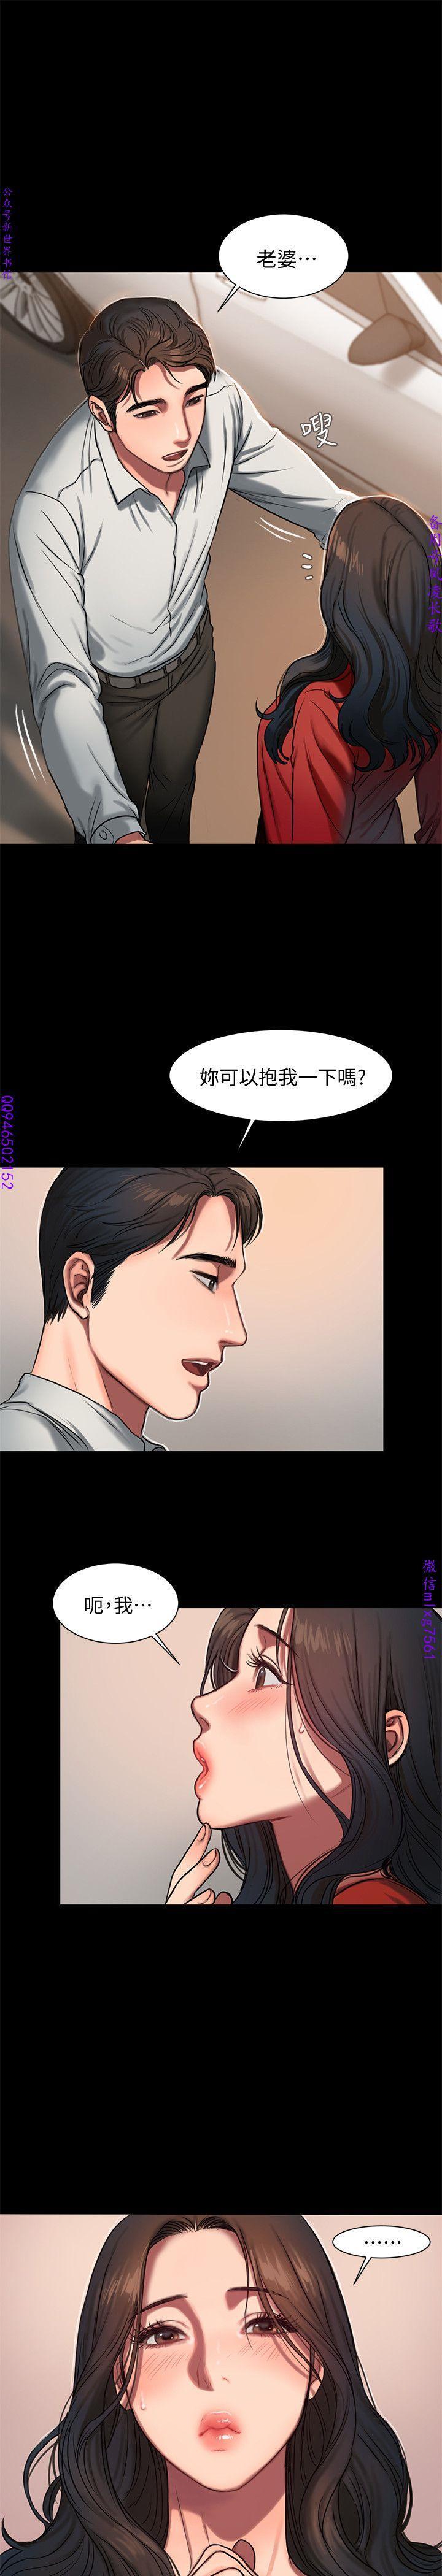 Run away 1-10【中文】 182